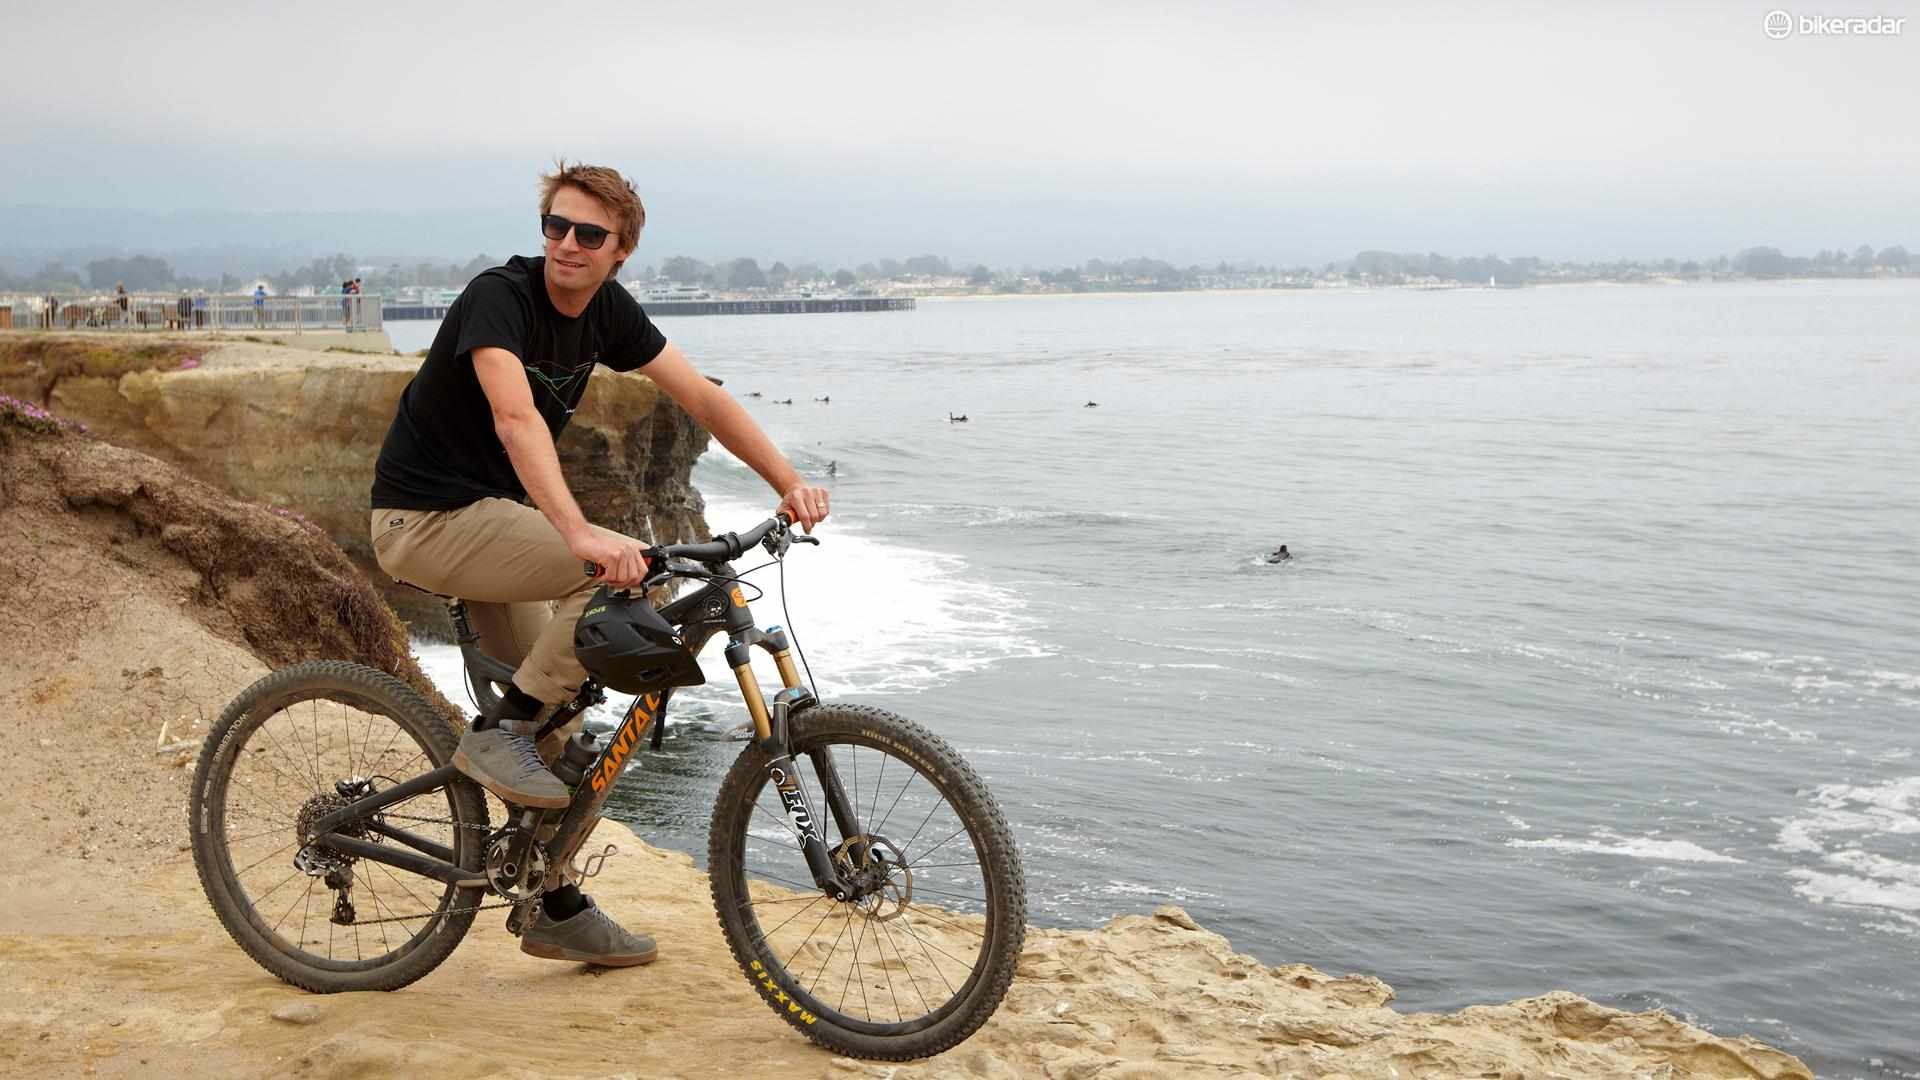 Dain Zaffke, Marketing Director of Giro Sport Design, in Santa Cruz, California